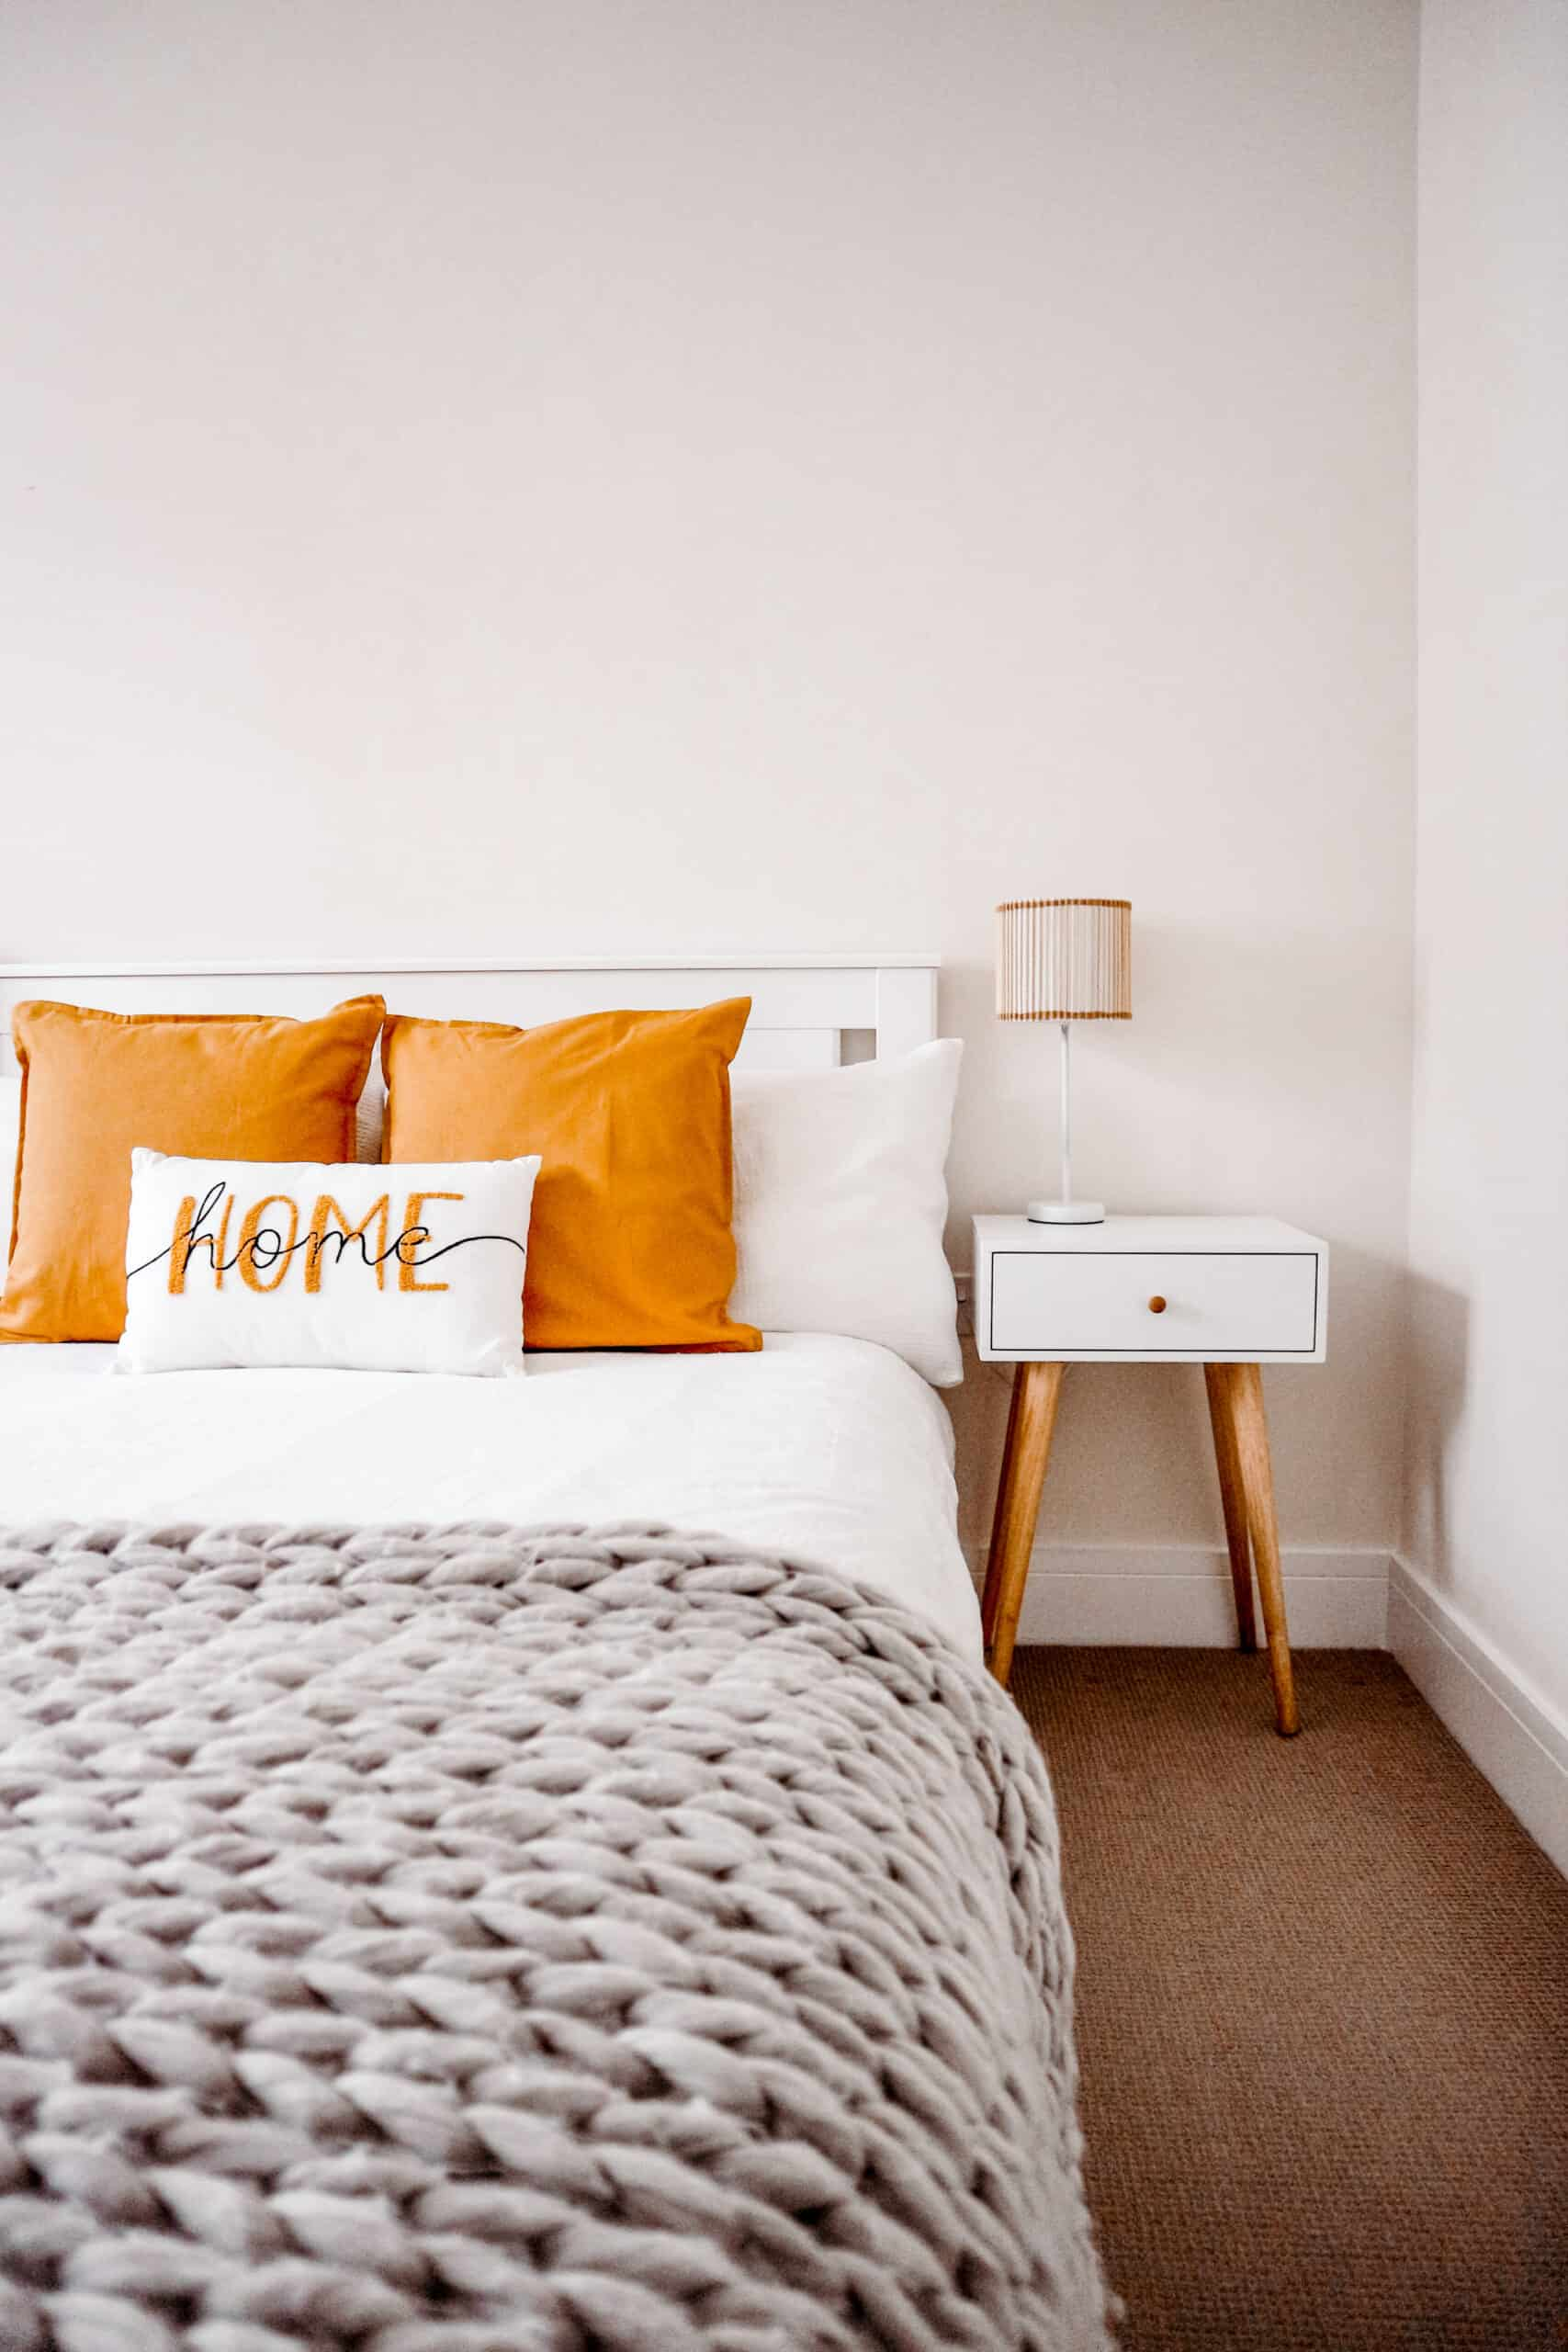 DIY Master Bedroom Makeover Ideas on a Budget